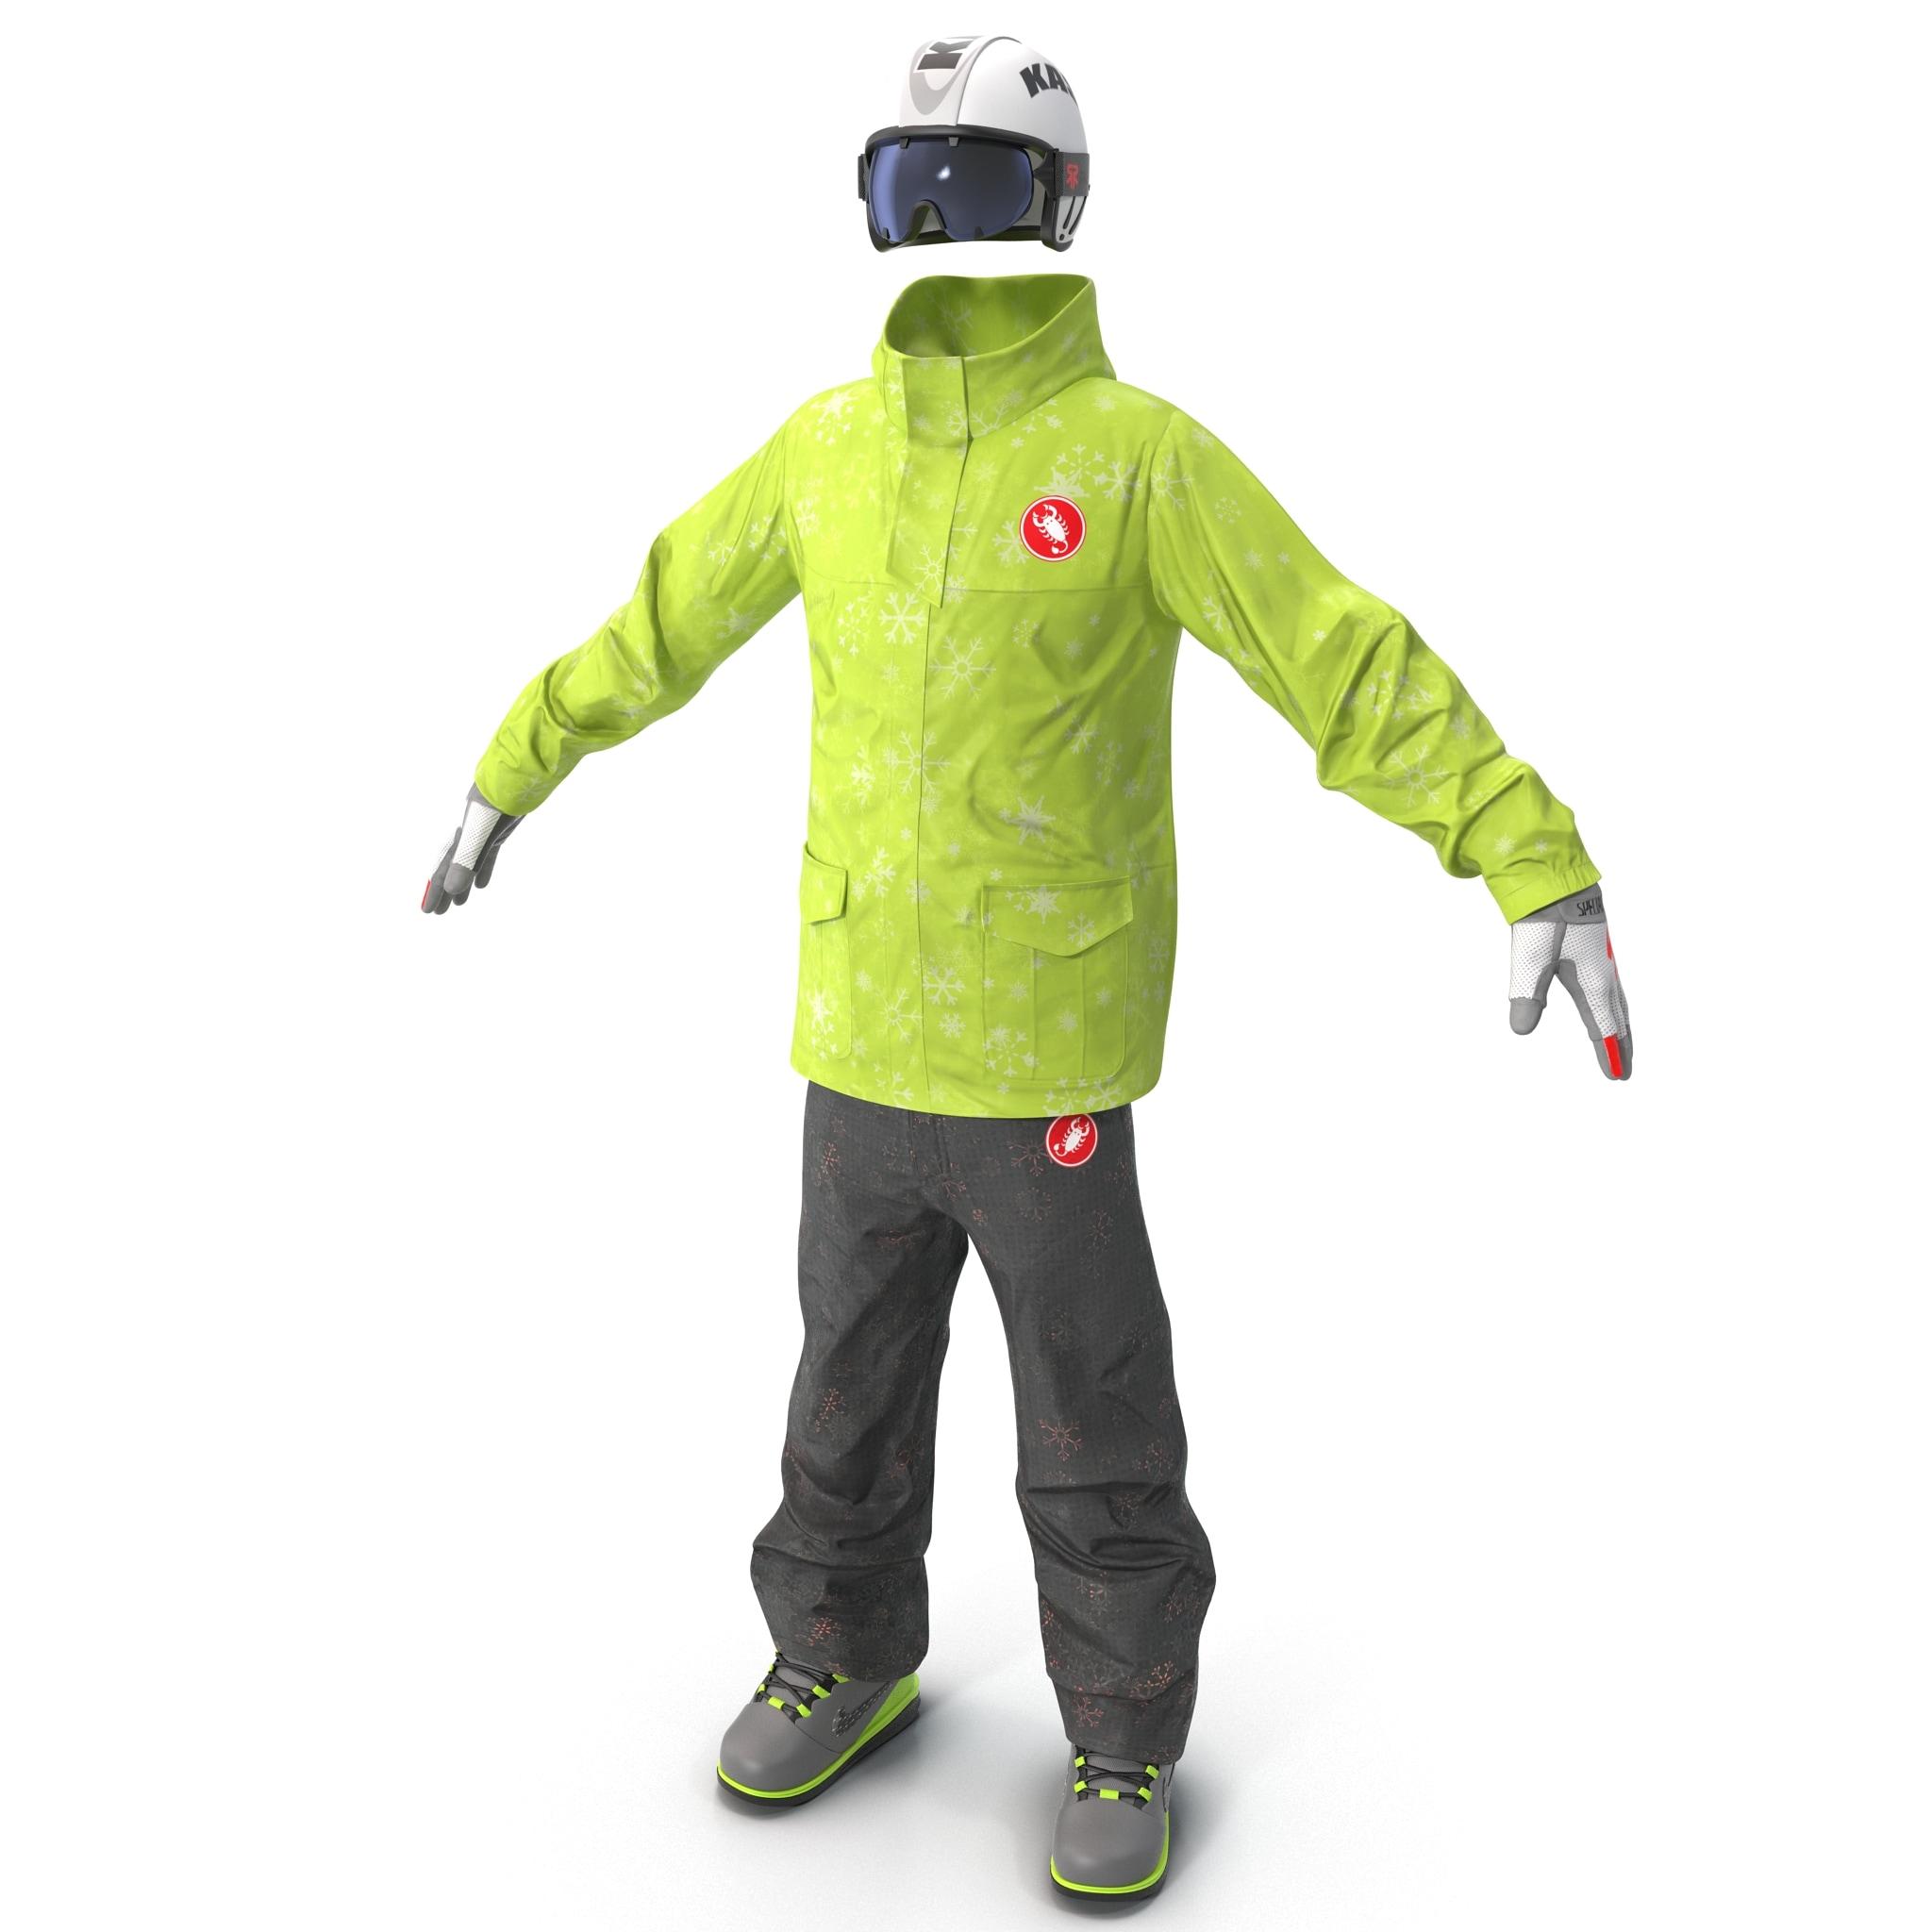 Snowboard Clothes_2.jpg